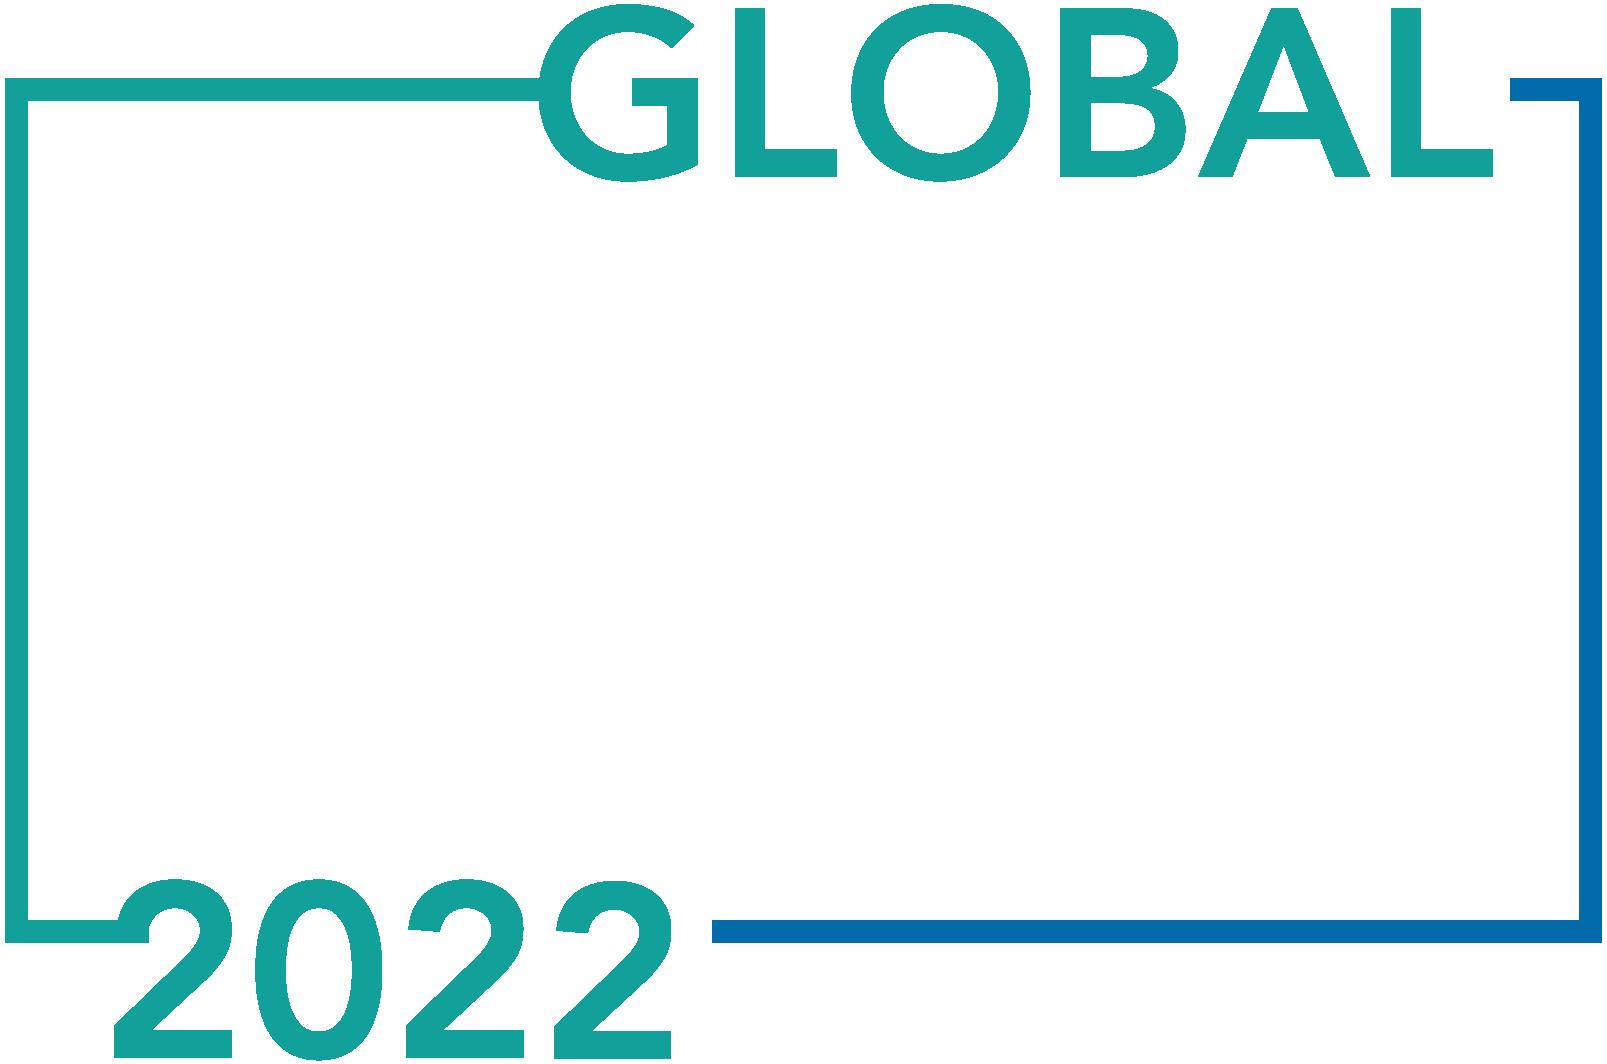 Global Agency Awards logo